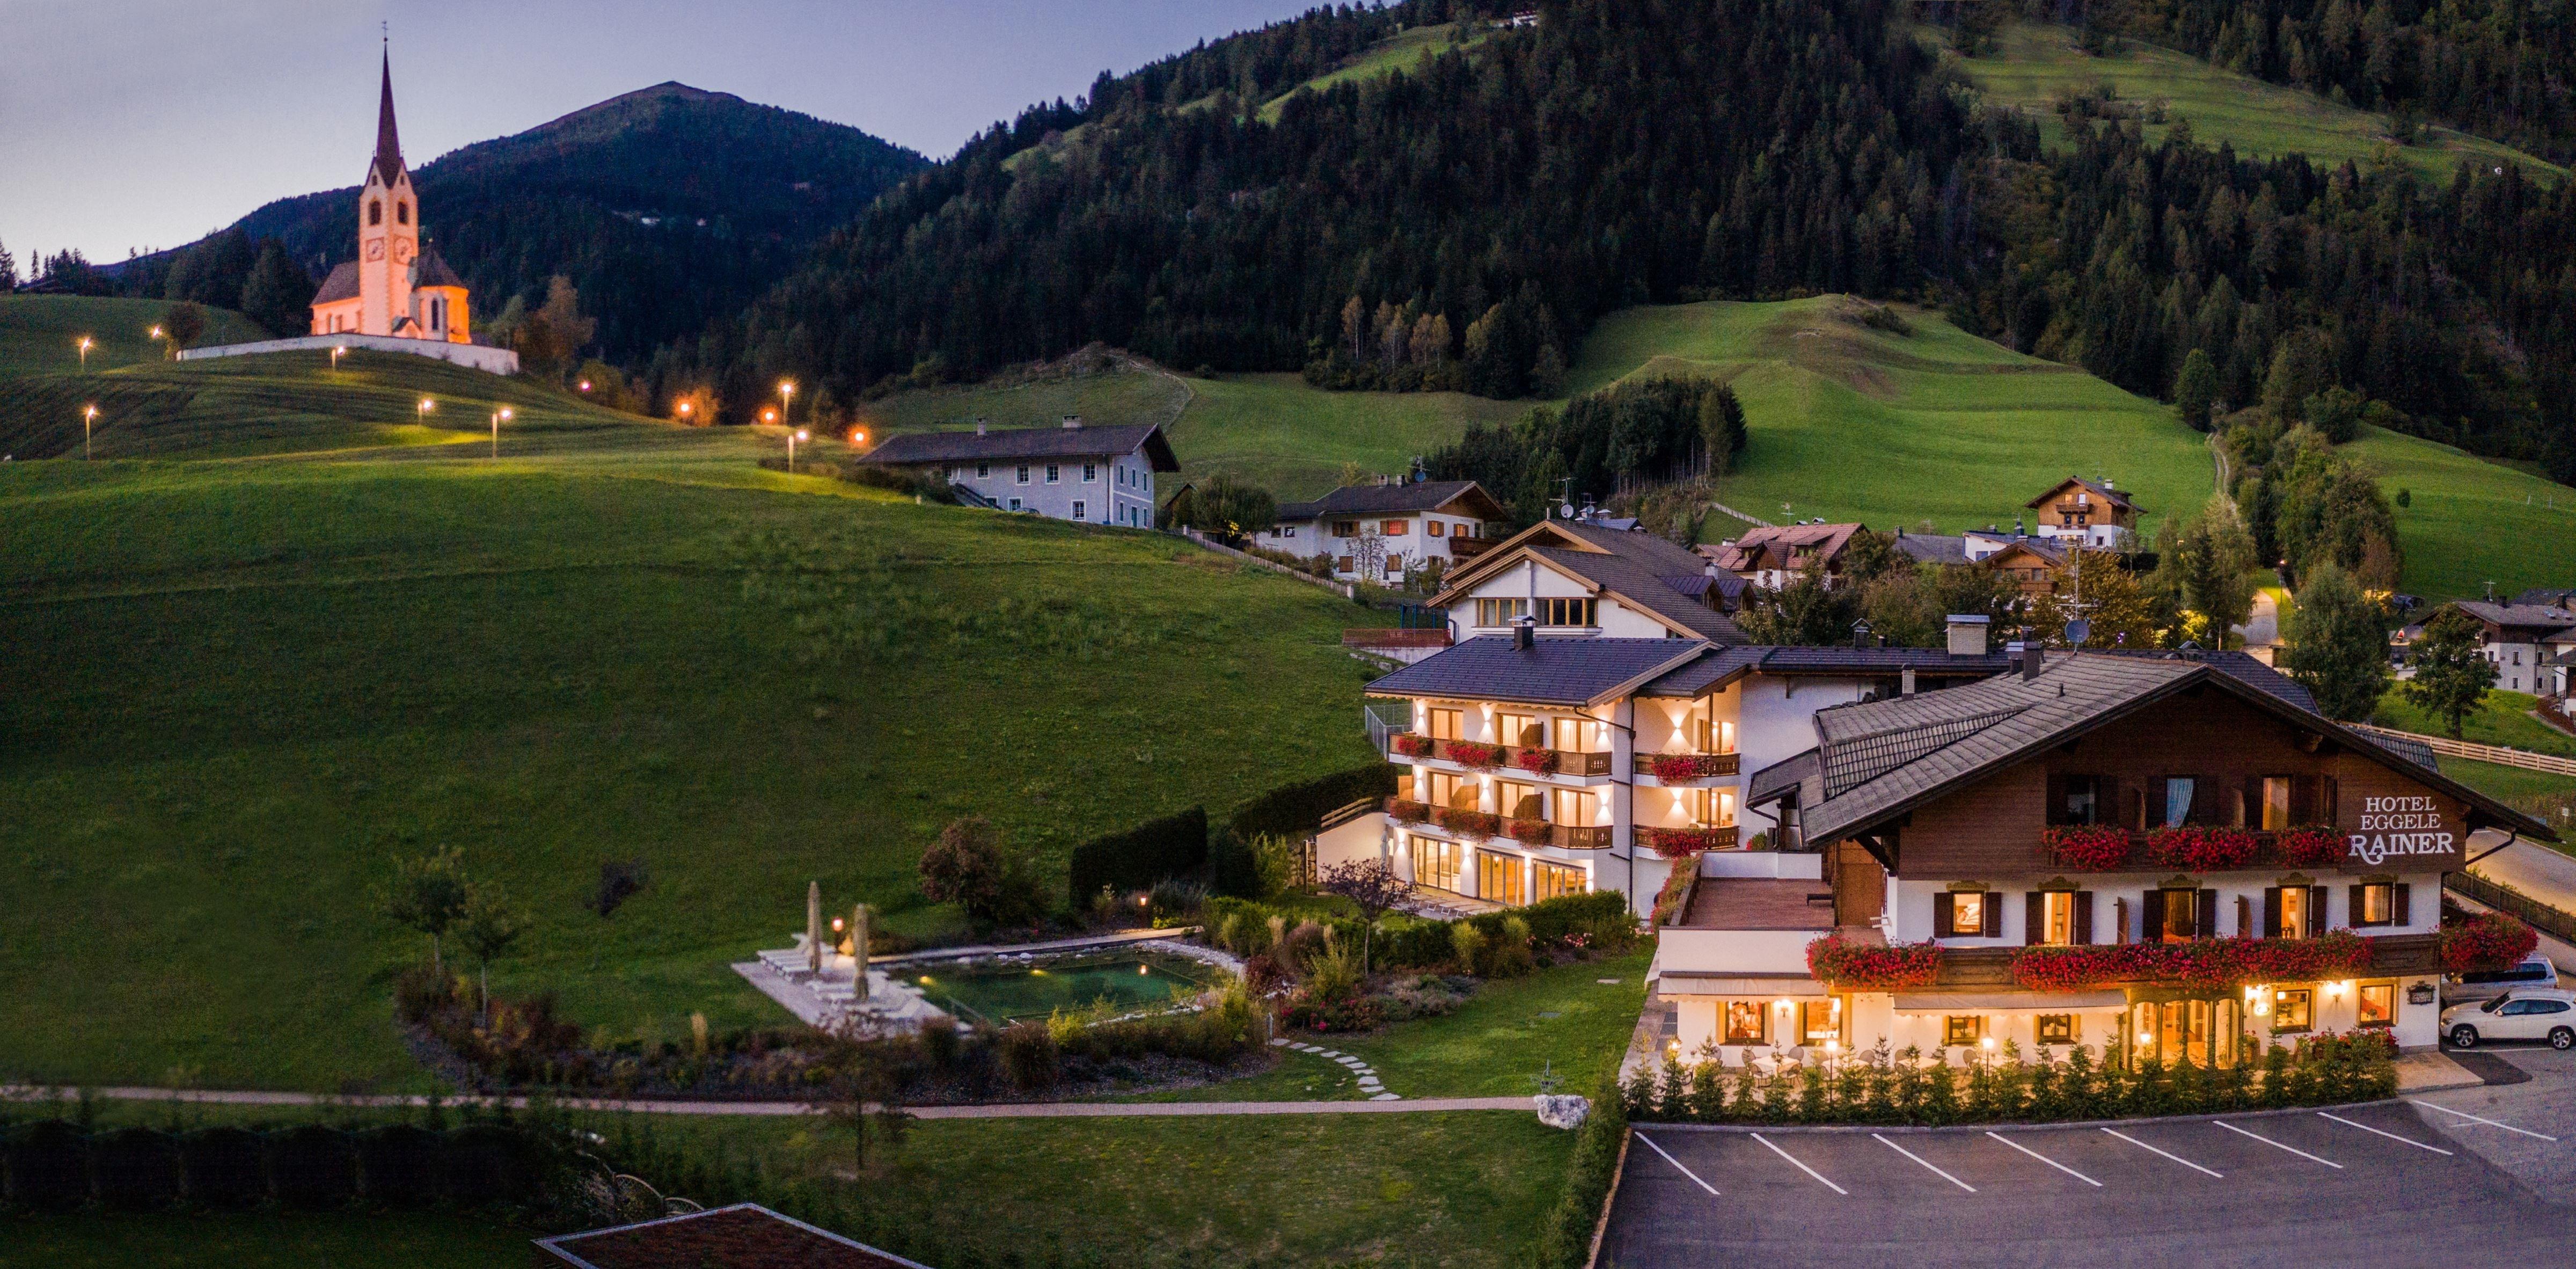 Hotel & Residence Rainer Eggele - Prato alla Drava, San Candido ...